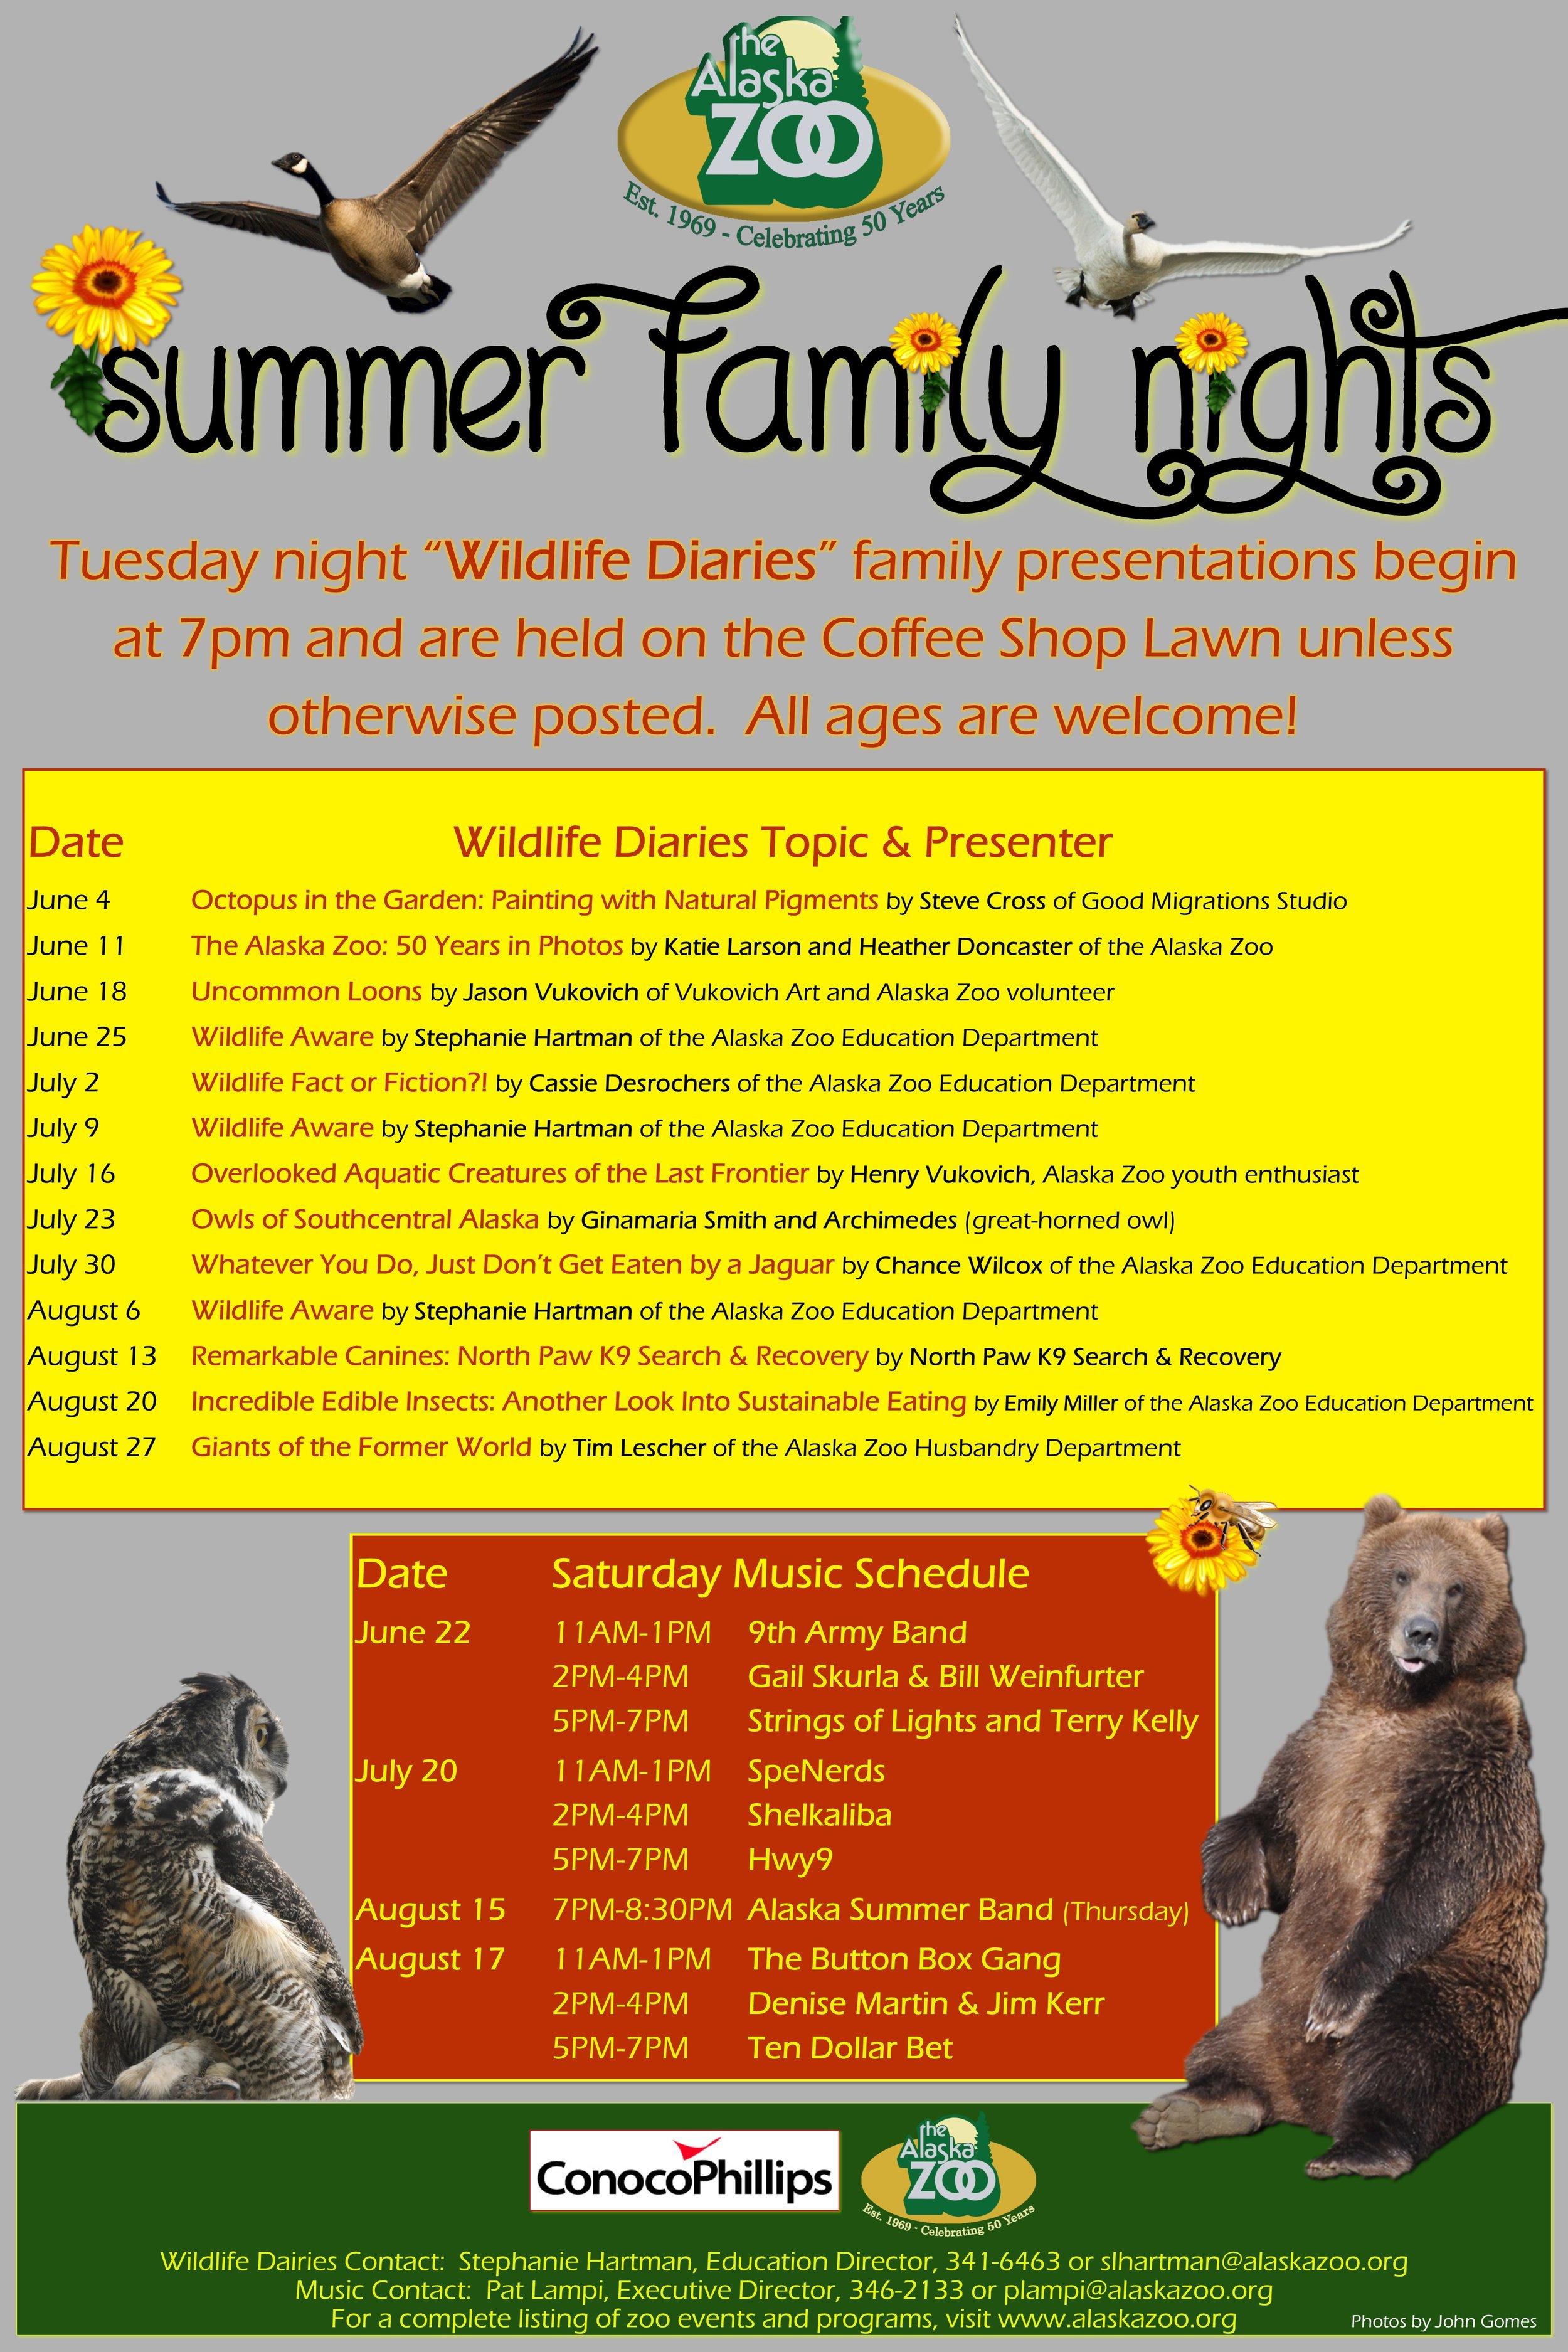 Summer Family Nights Poster 24x36.jpg